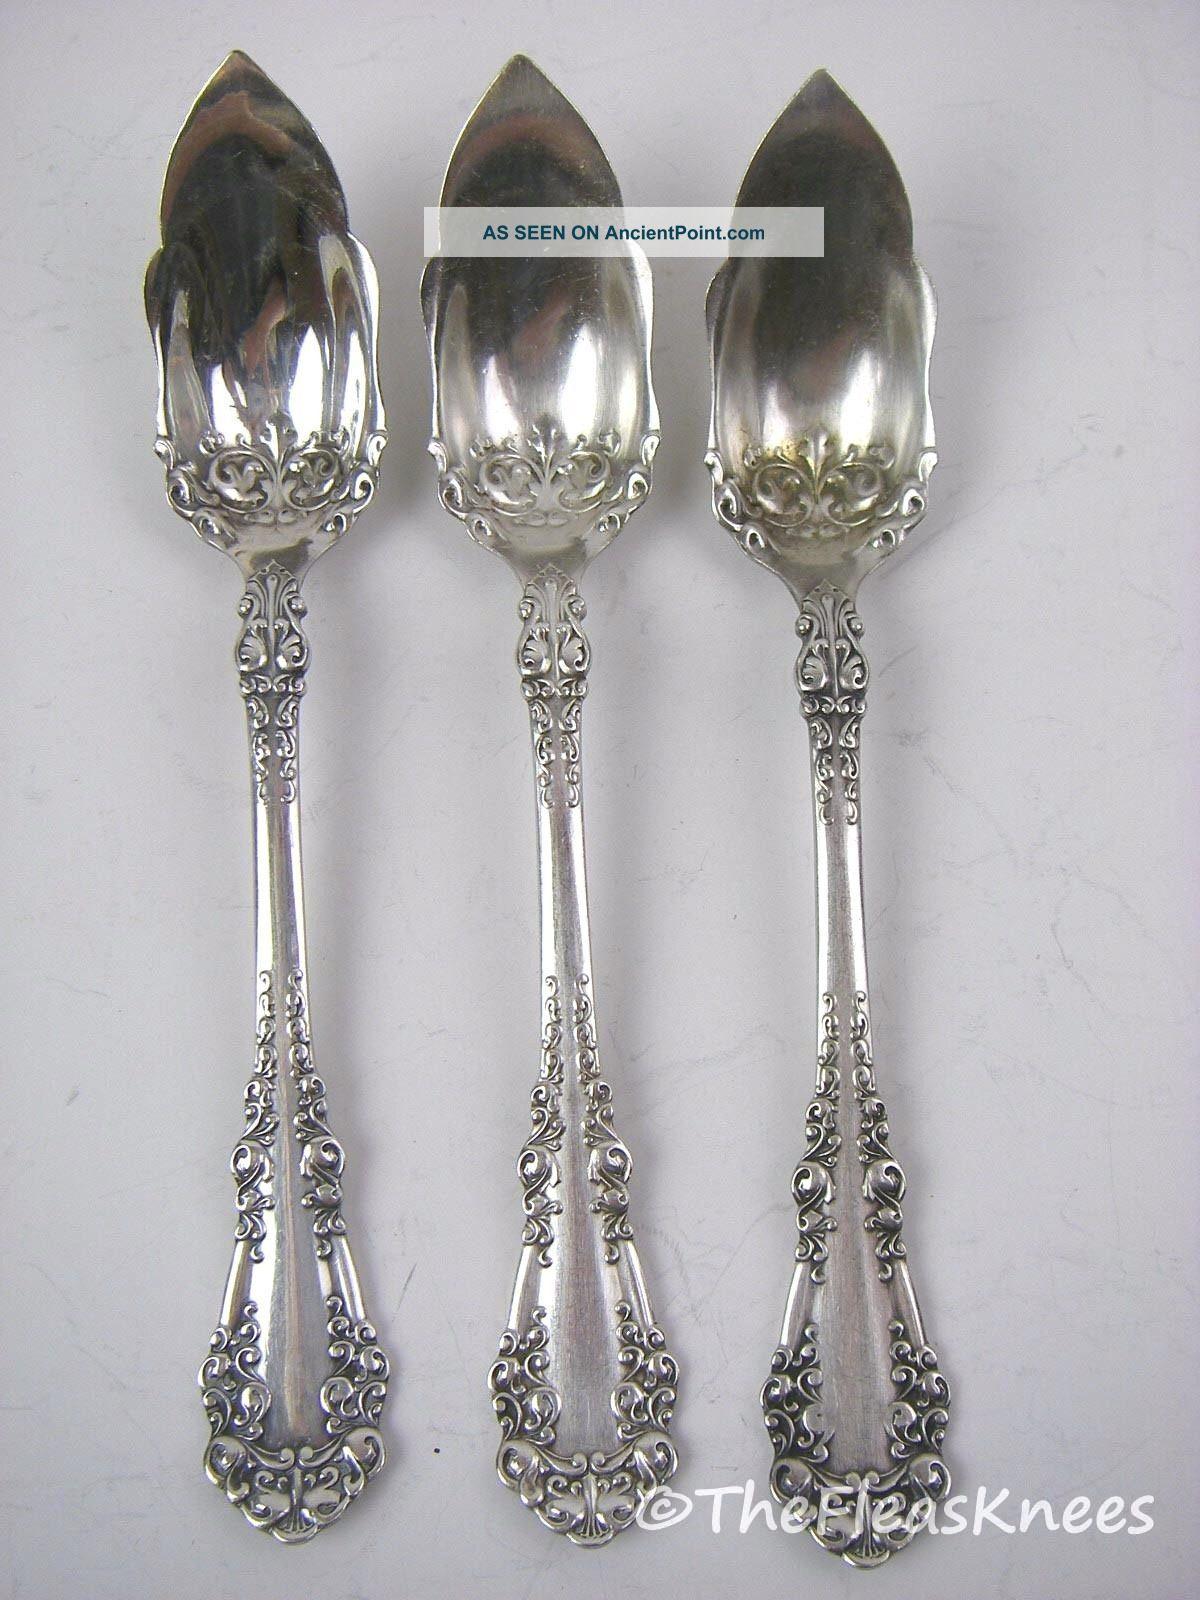 1847 Rogers Bros A1 Silverplate Berkshire 3 Fruit Spoons Flatware & Silverware photo